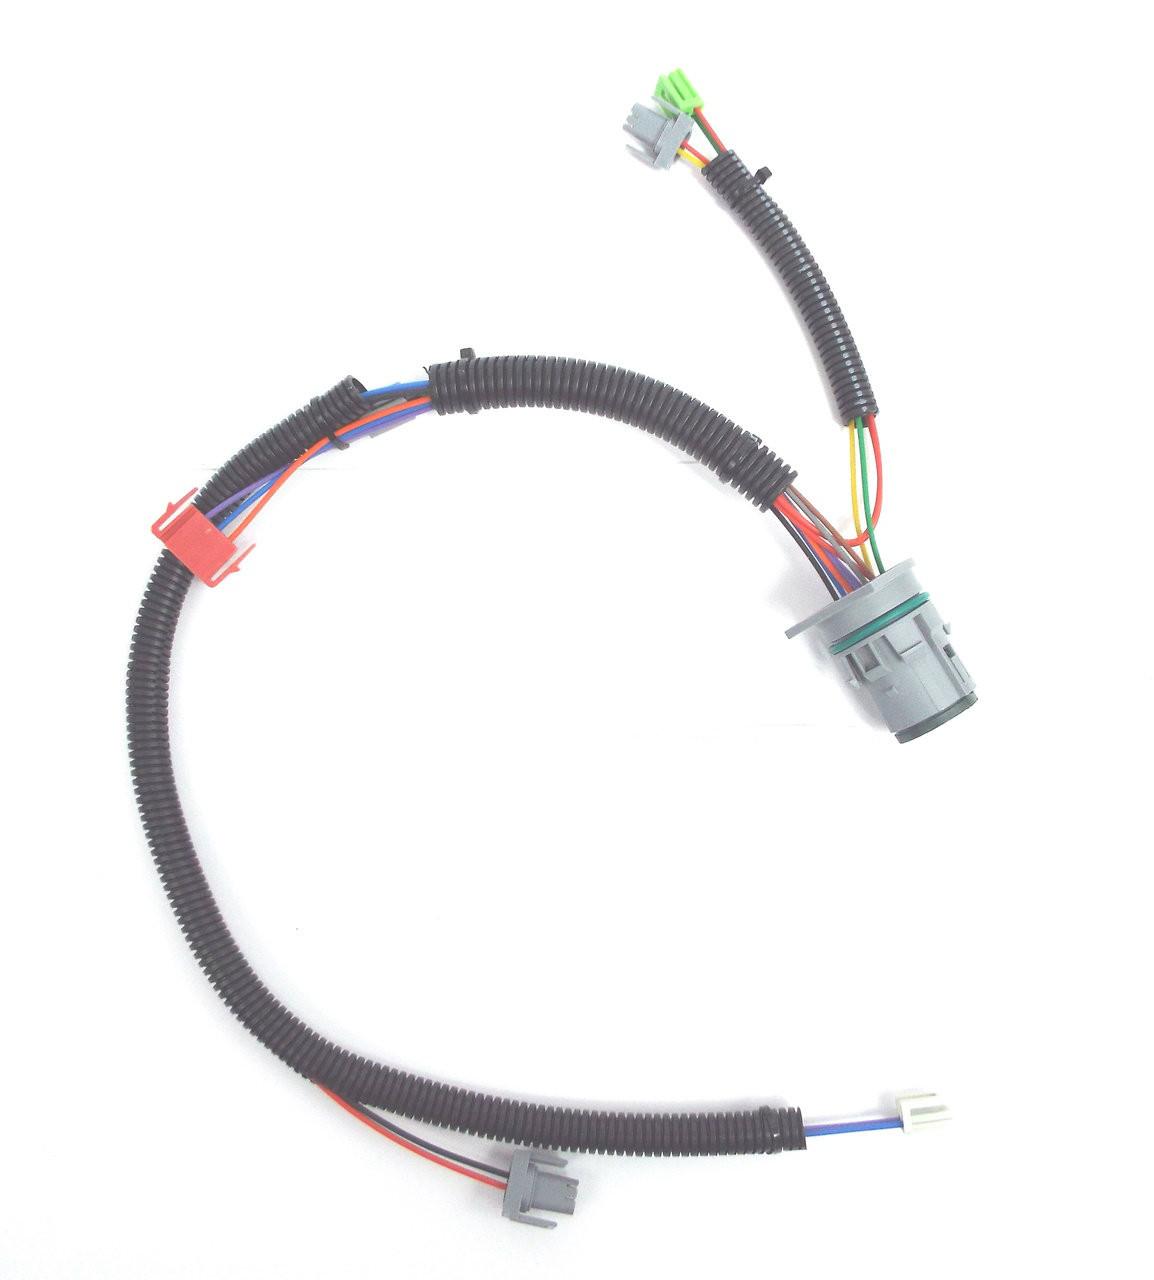 4l80e internal wiring harness (2004 up) 24200161 Automatic Transmission Module Wiring Harness